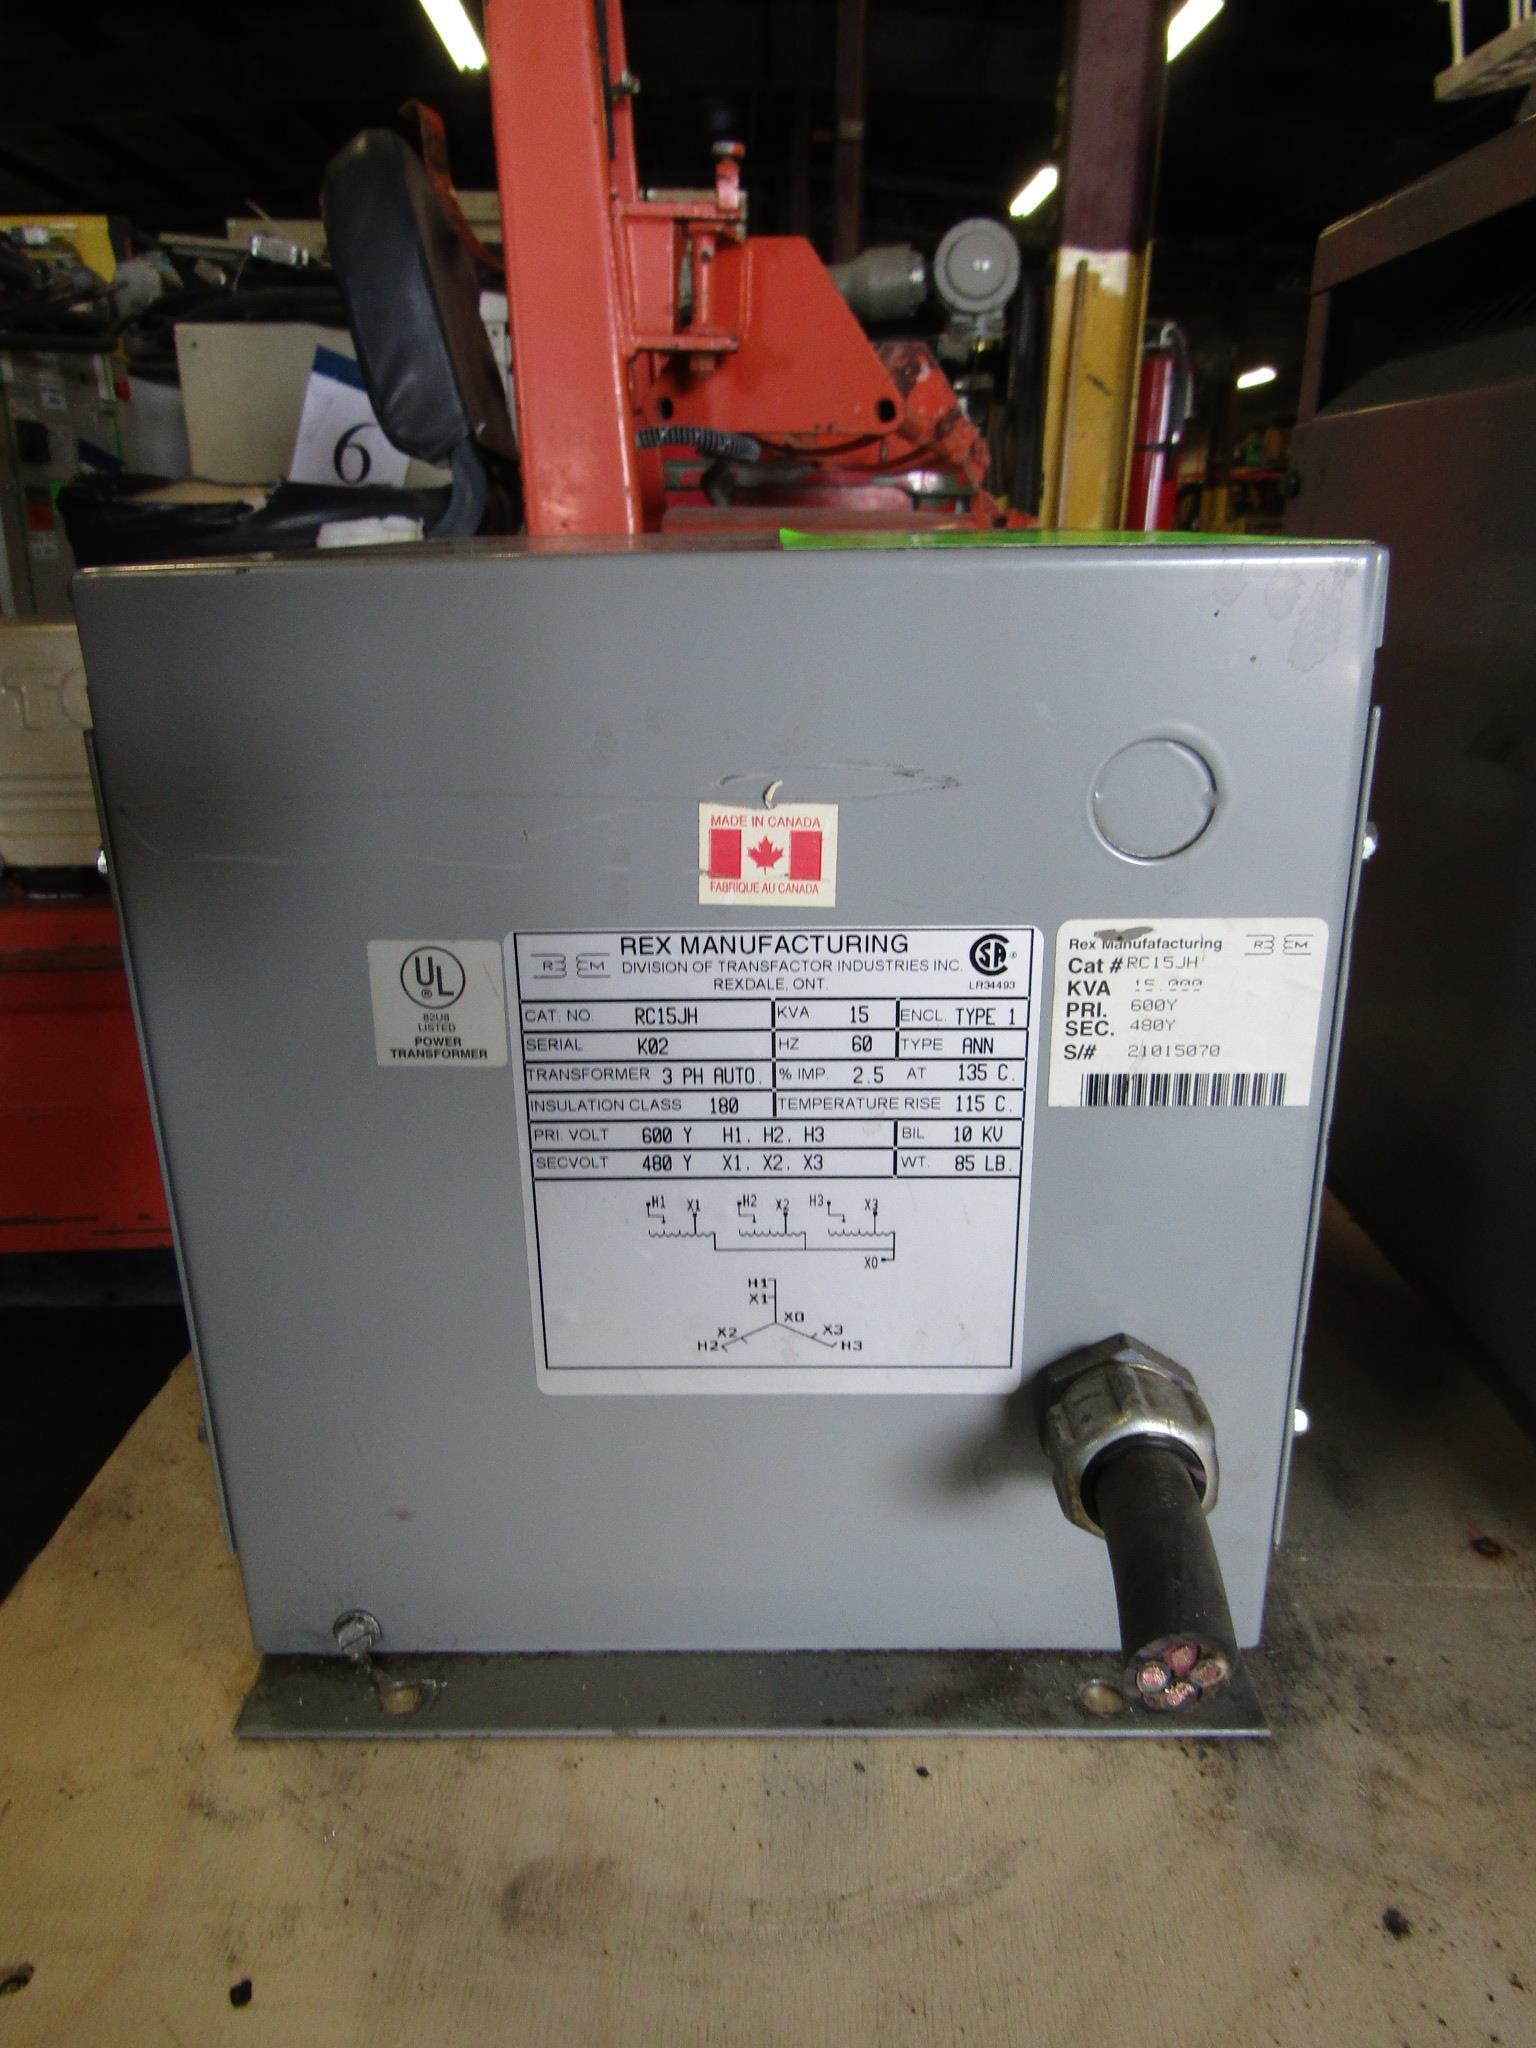 Lot 31 - Rex 15 KVA Electrical Transformer 3 phase AUTO 600Y to 480Y